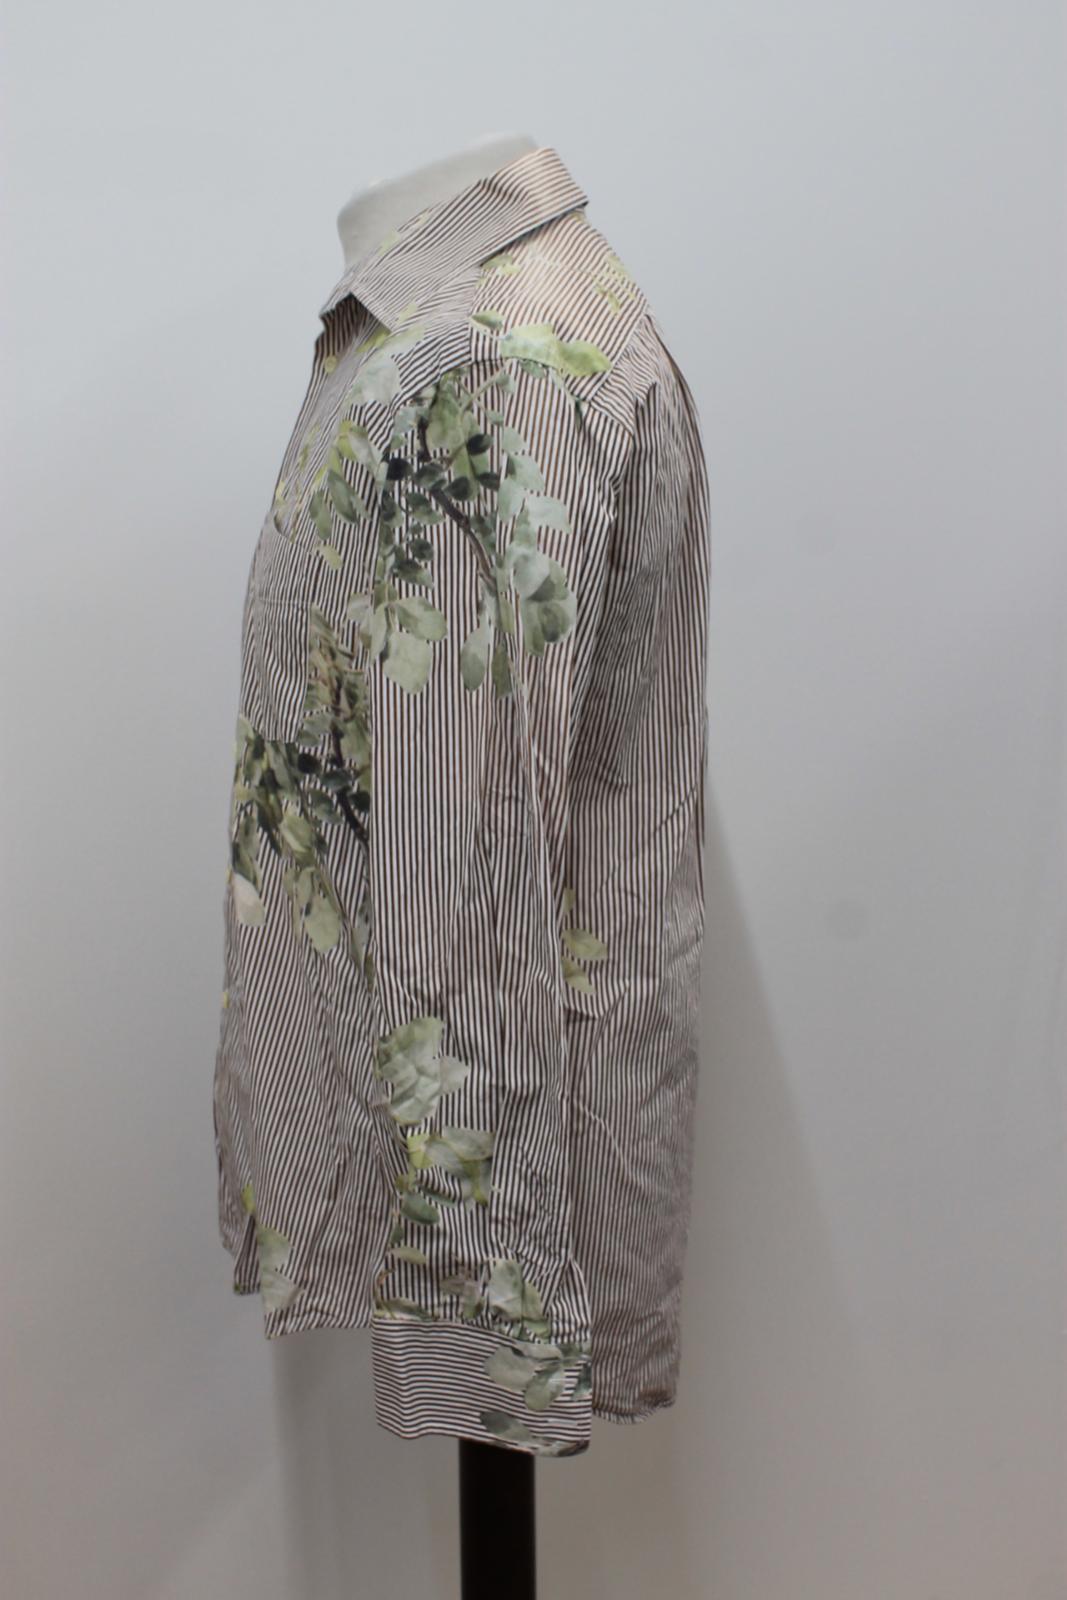 Paul-Smith-Para-Hombre-Marron-Verde-A-Rayas-Manga-Larga-de-impresion-de-hojas-Algodon-Camisa-Tamano miniatura 7